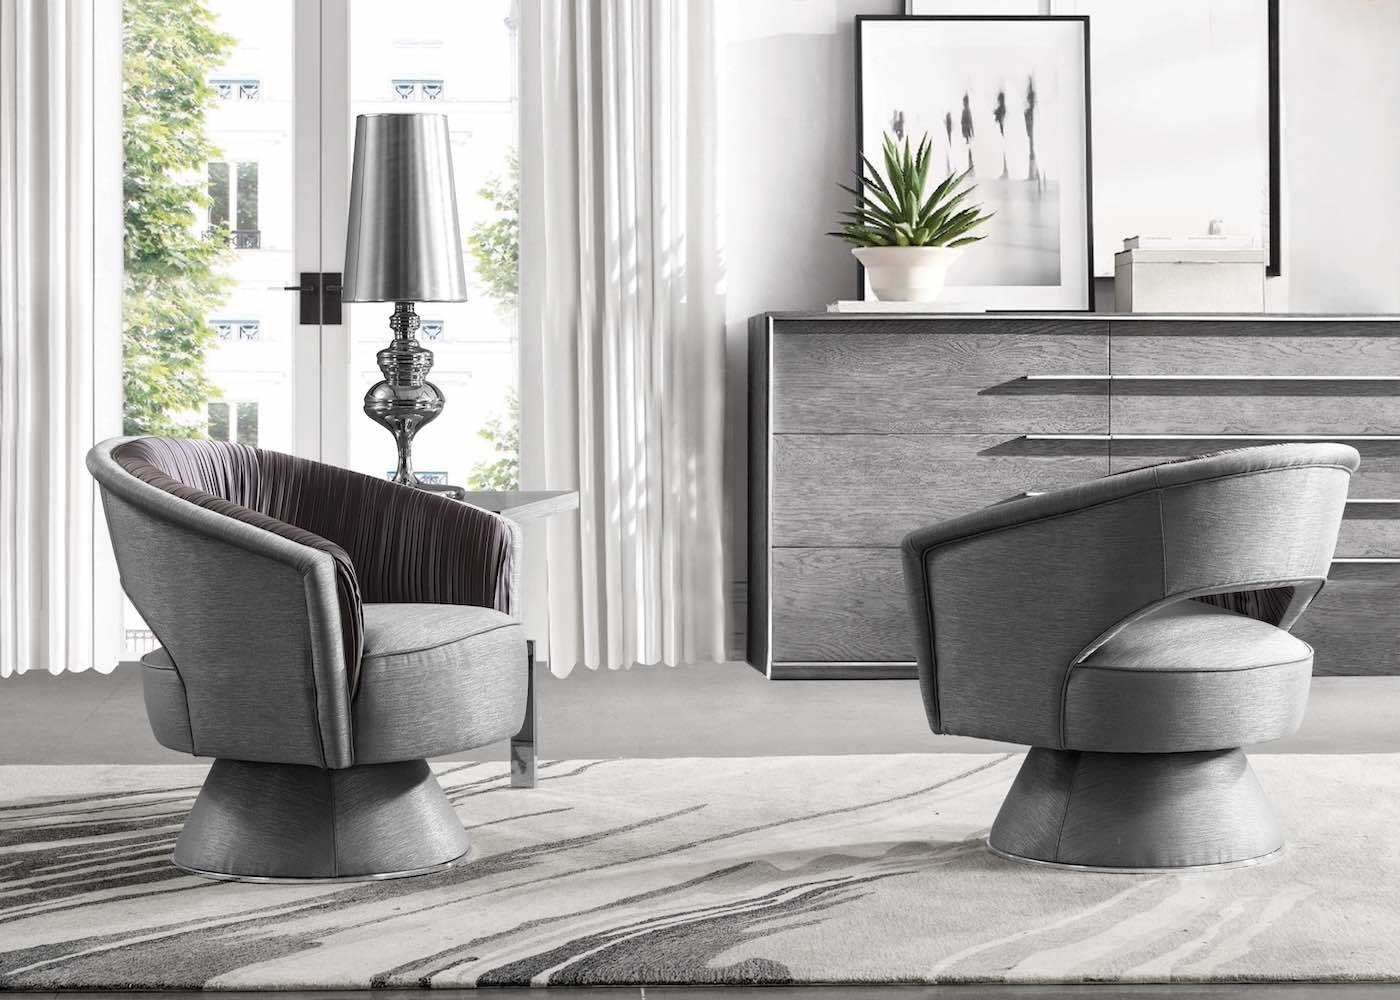 mazarin-ameublement-catalogue-produits-chaise-fauteuil-27